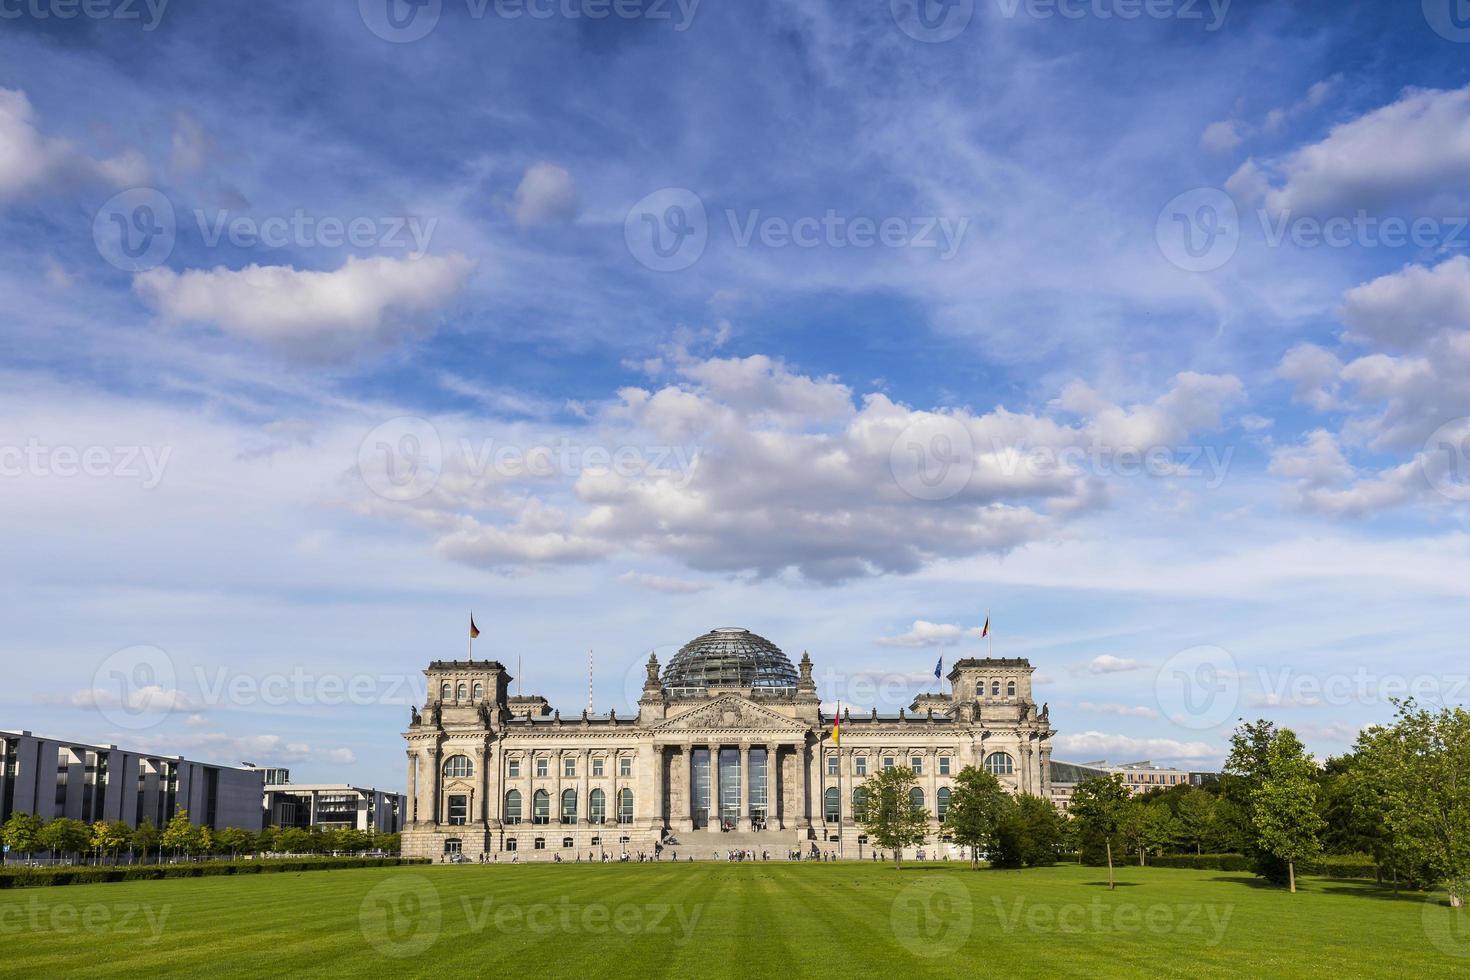 Bâtiment du Parlement allemand (Reichstag) à Berlin photo